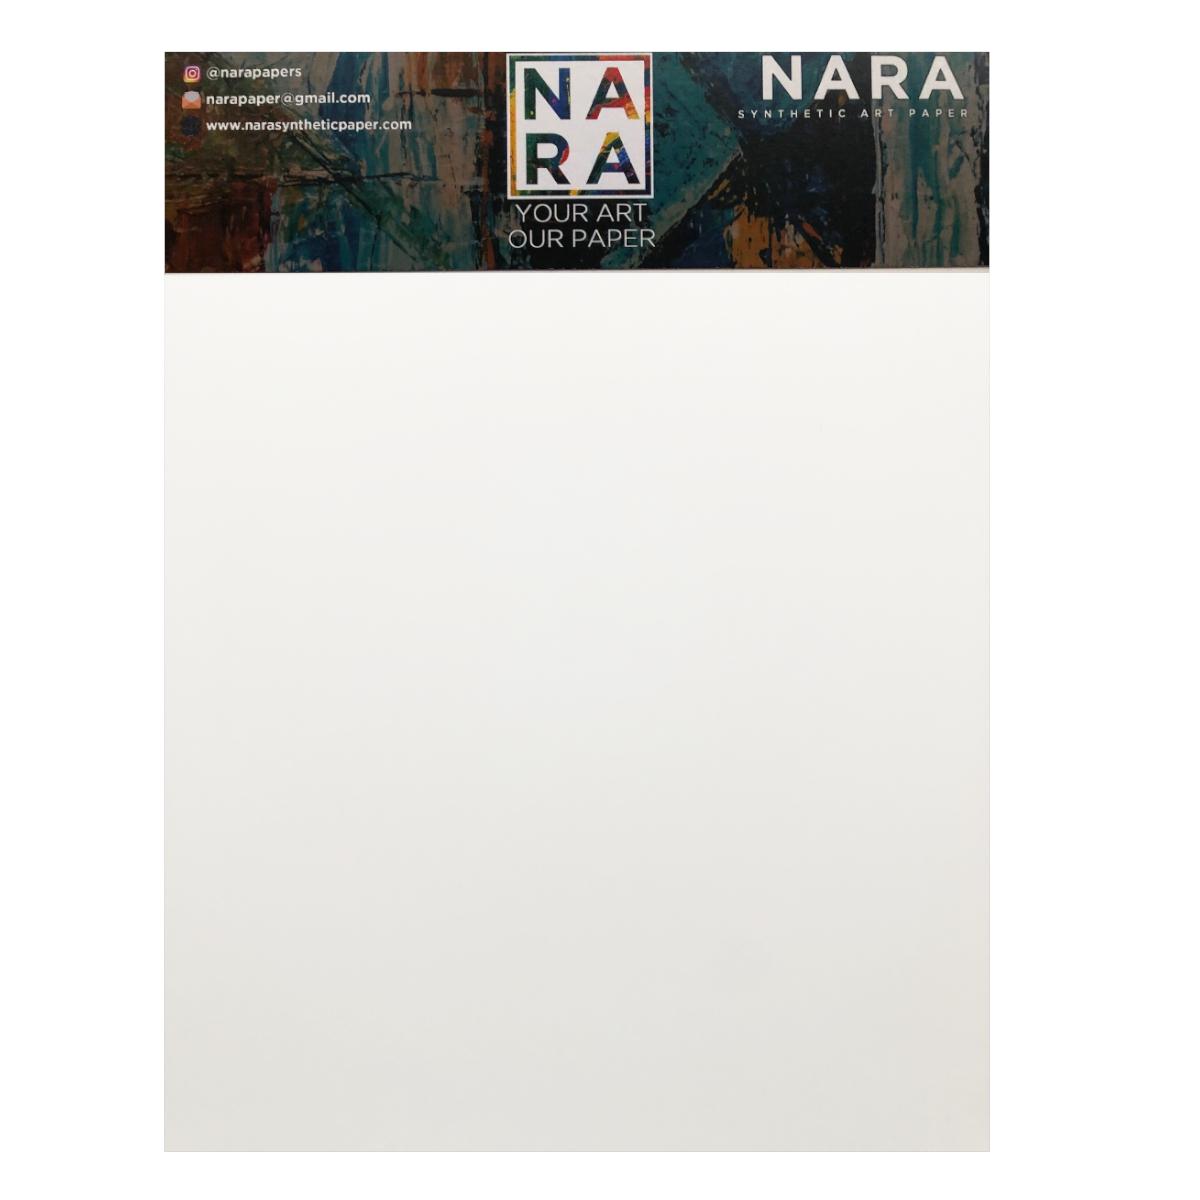 Nara papir, hvid, 10 ark, 200 g, 30,8 x 45,8 cm